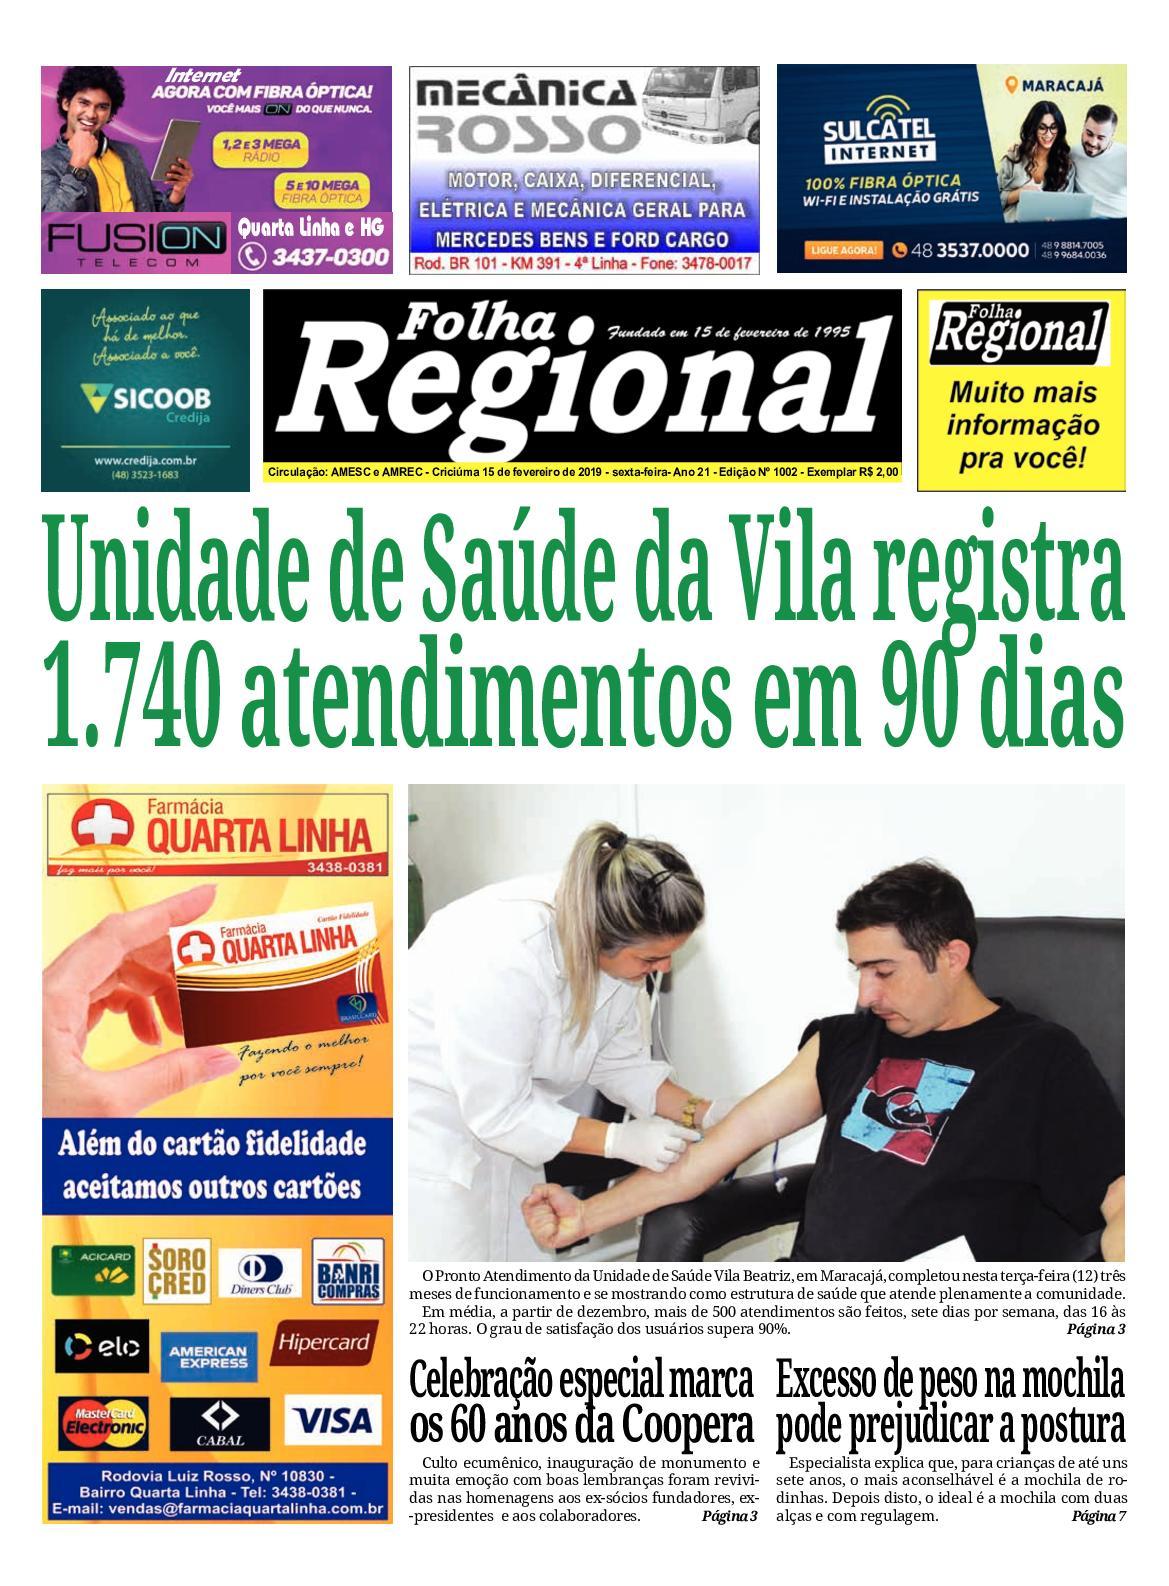 Folha Regional Ed.1002 - 15/02/2019